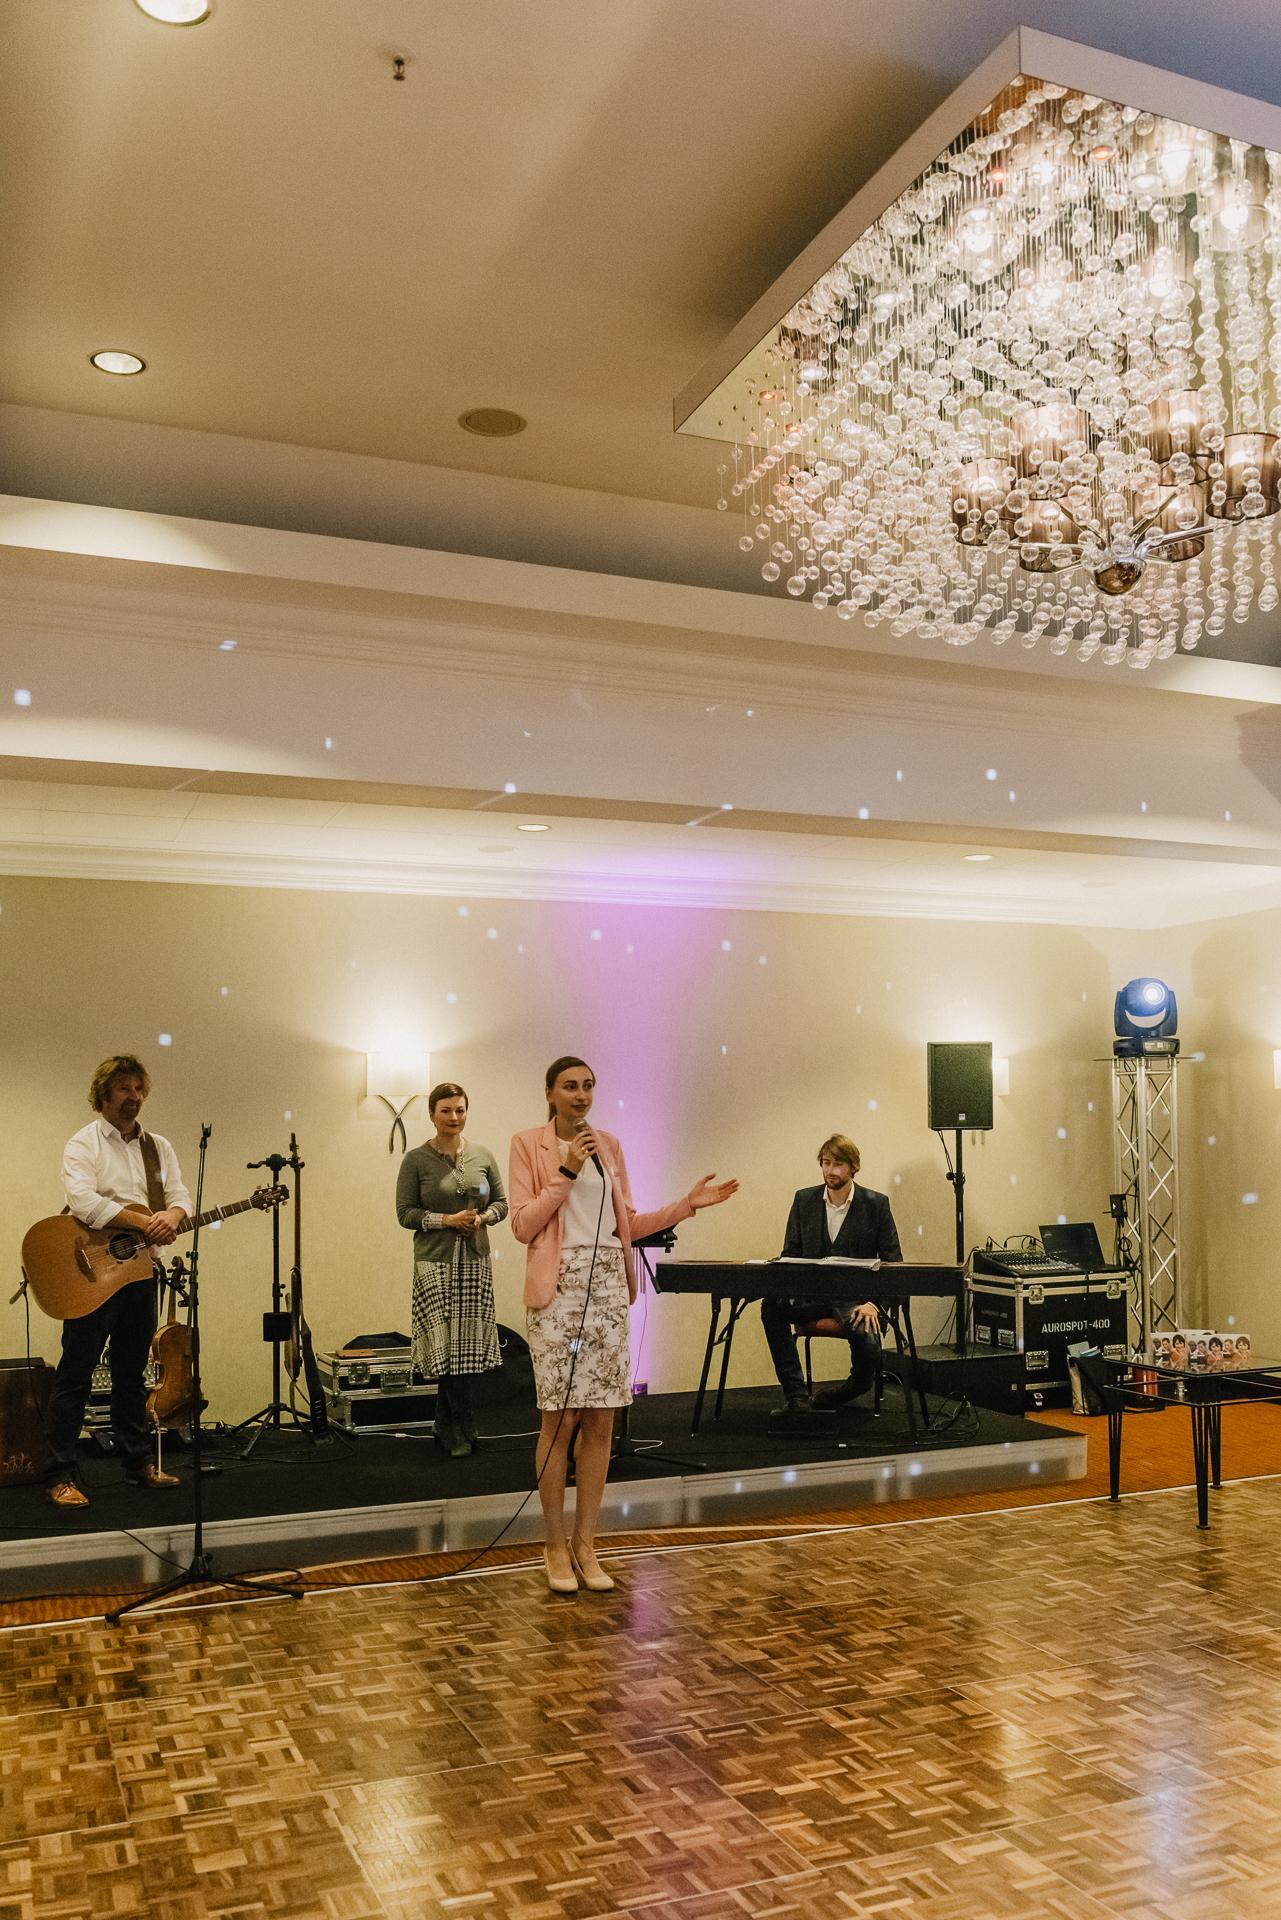 Zweinander-LeonoreHerzog-WeddingMarket-OnTour20191110-9171